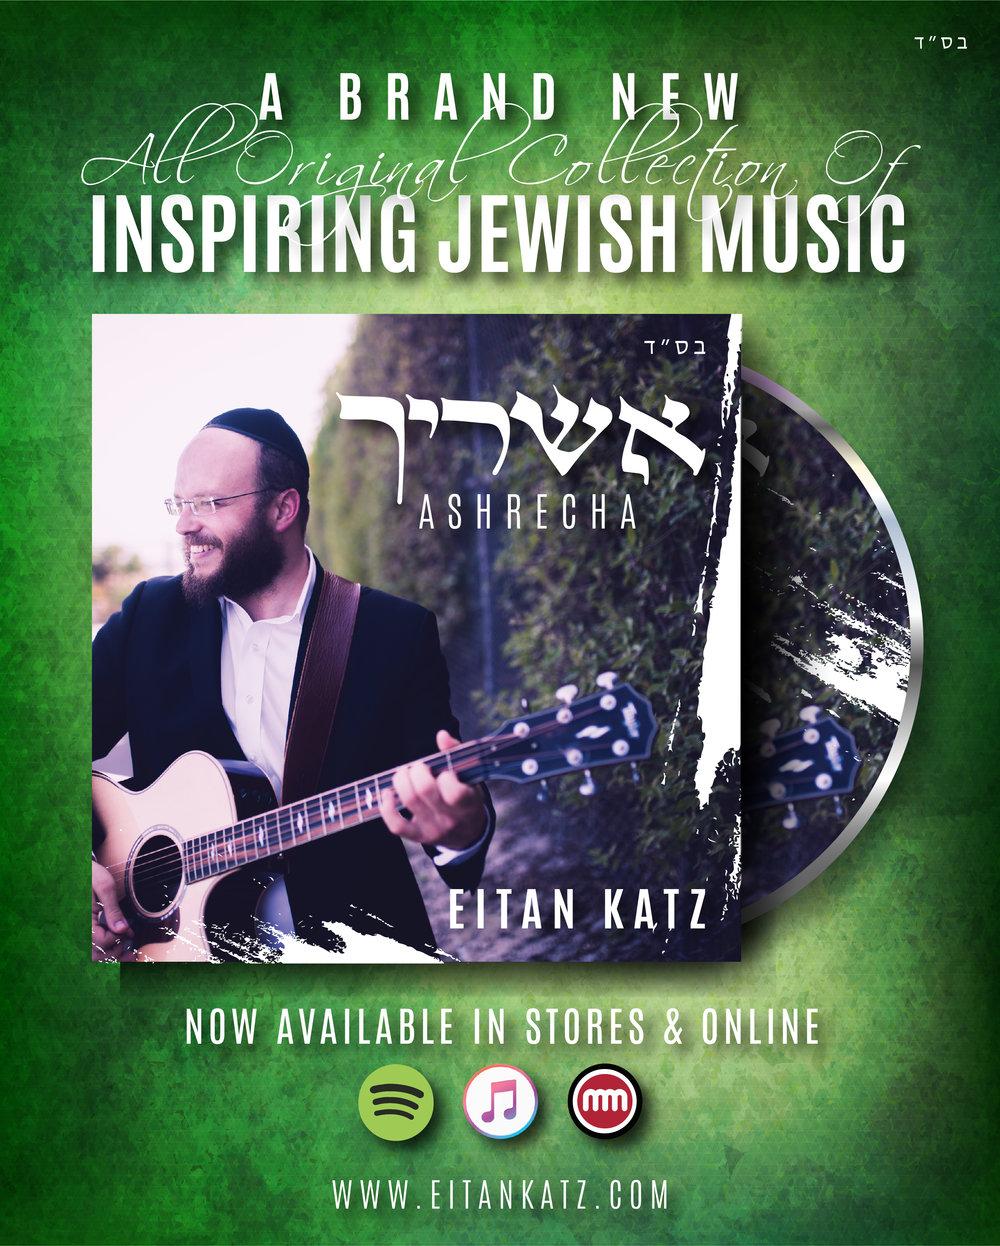 Ashrecha - Album Art and Promotional Materials, Eitan Katz